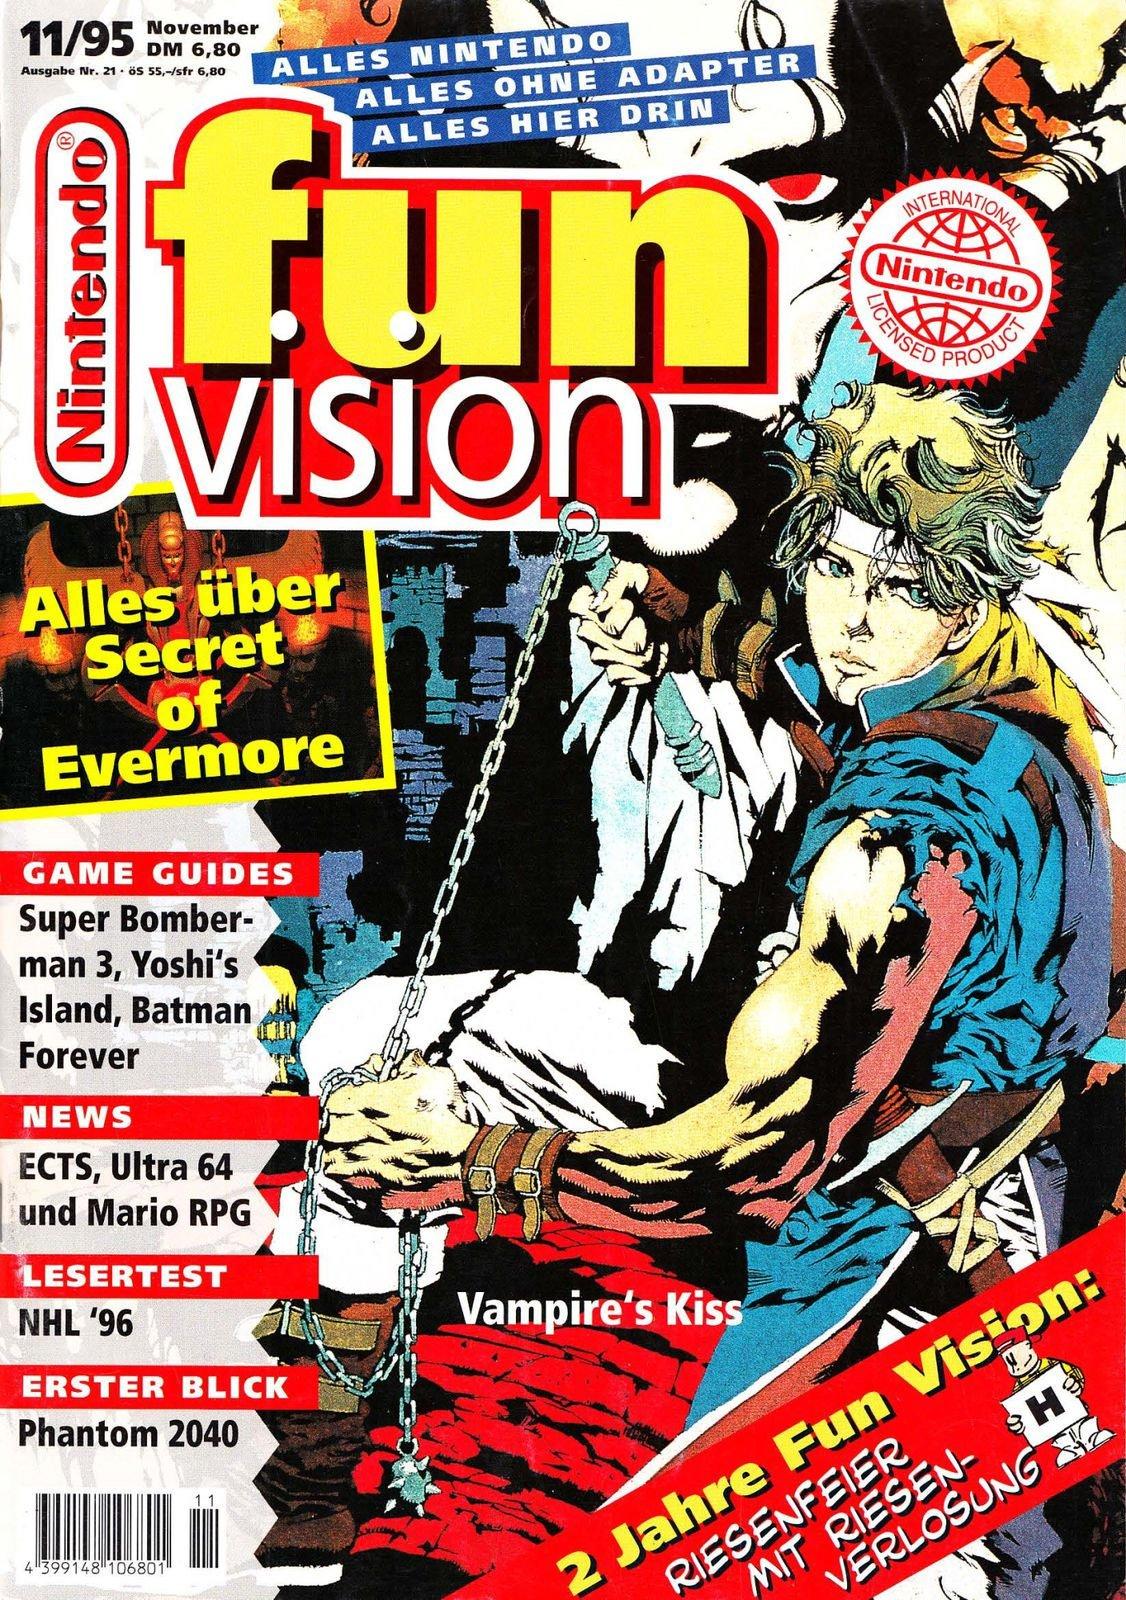 Nintendo Fun Vision Issue 21 (November 1995)